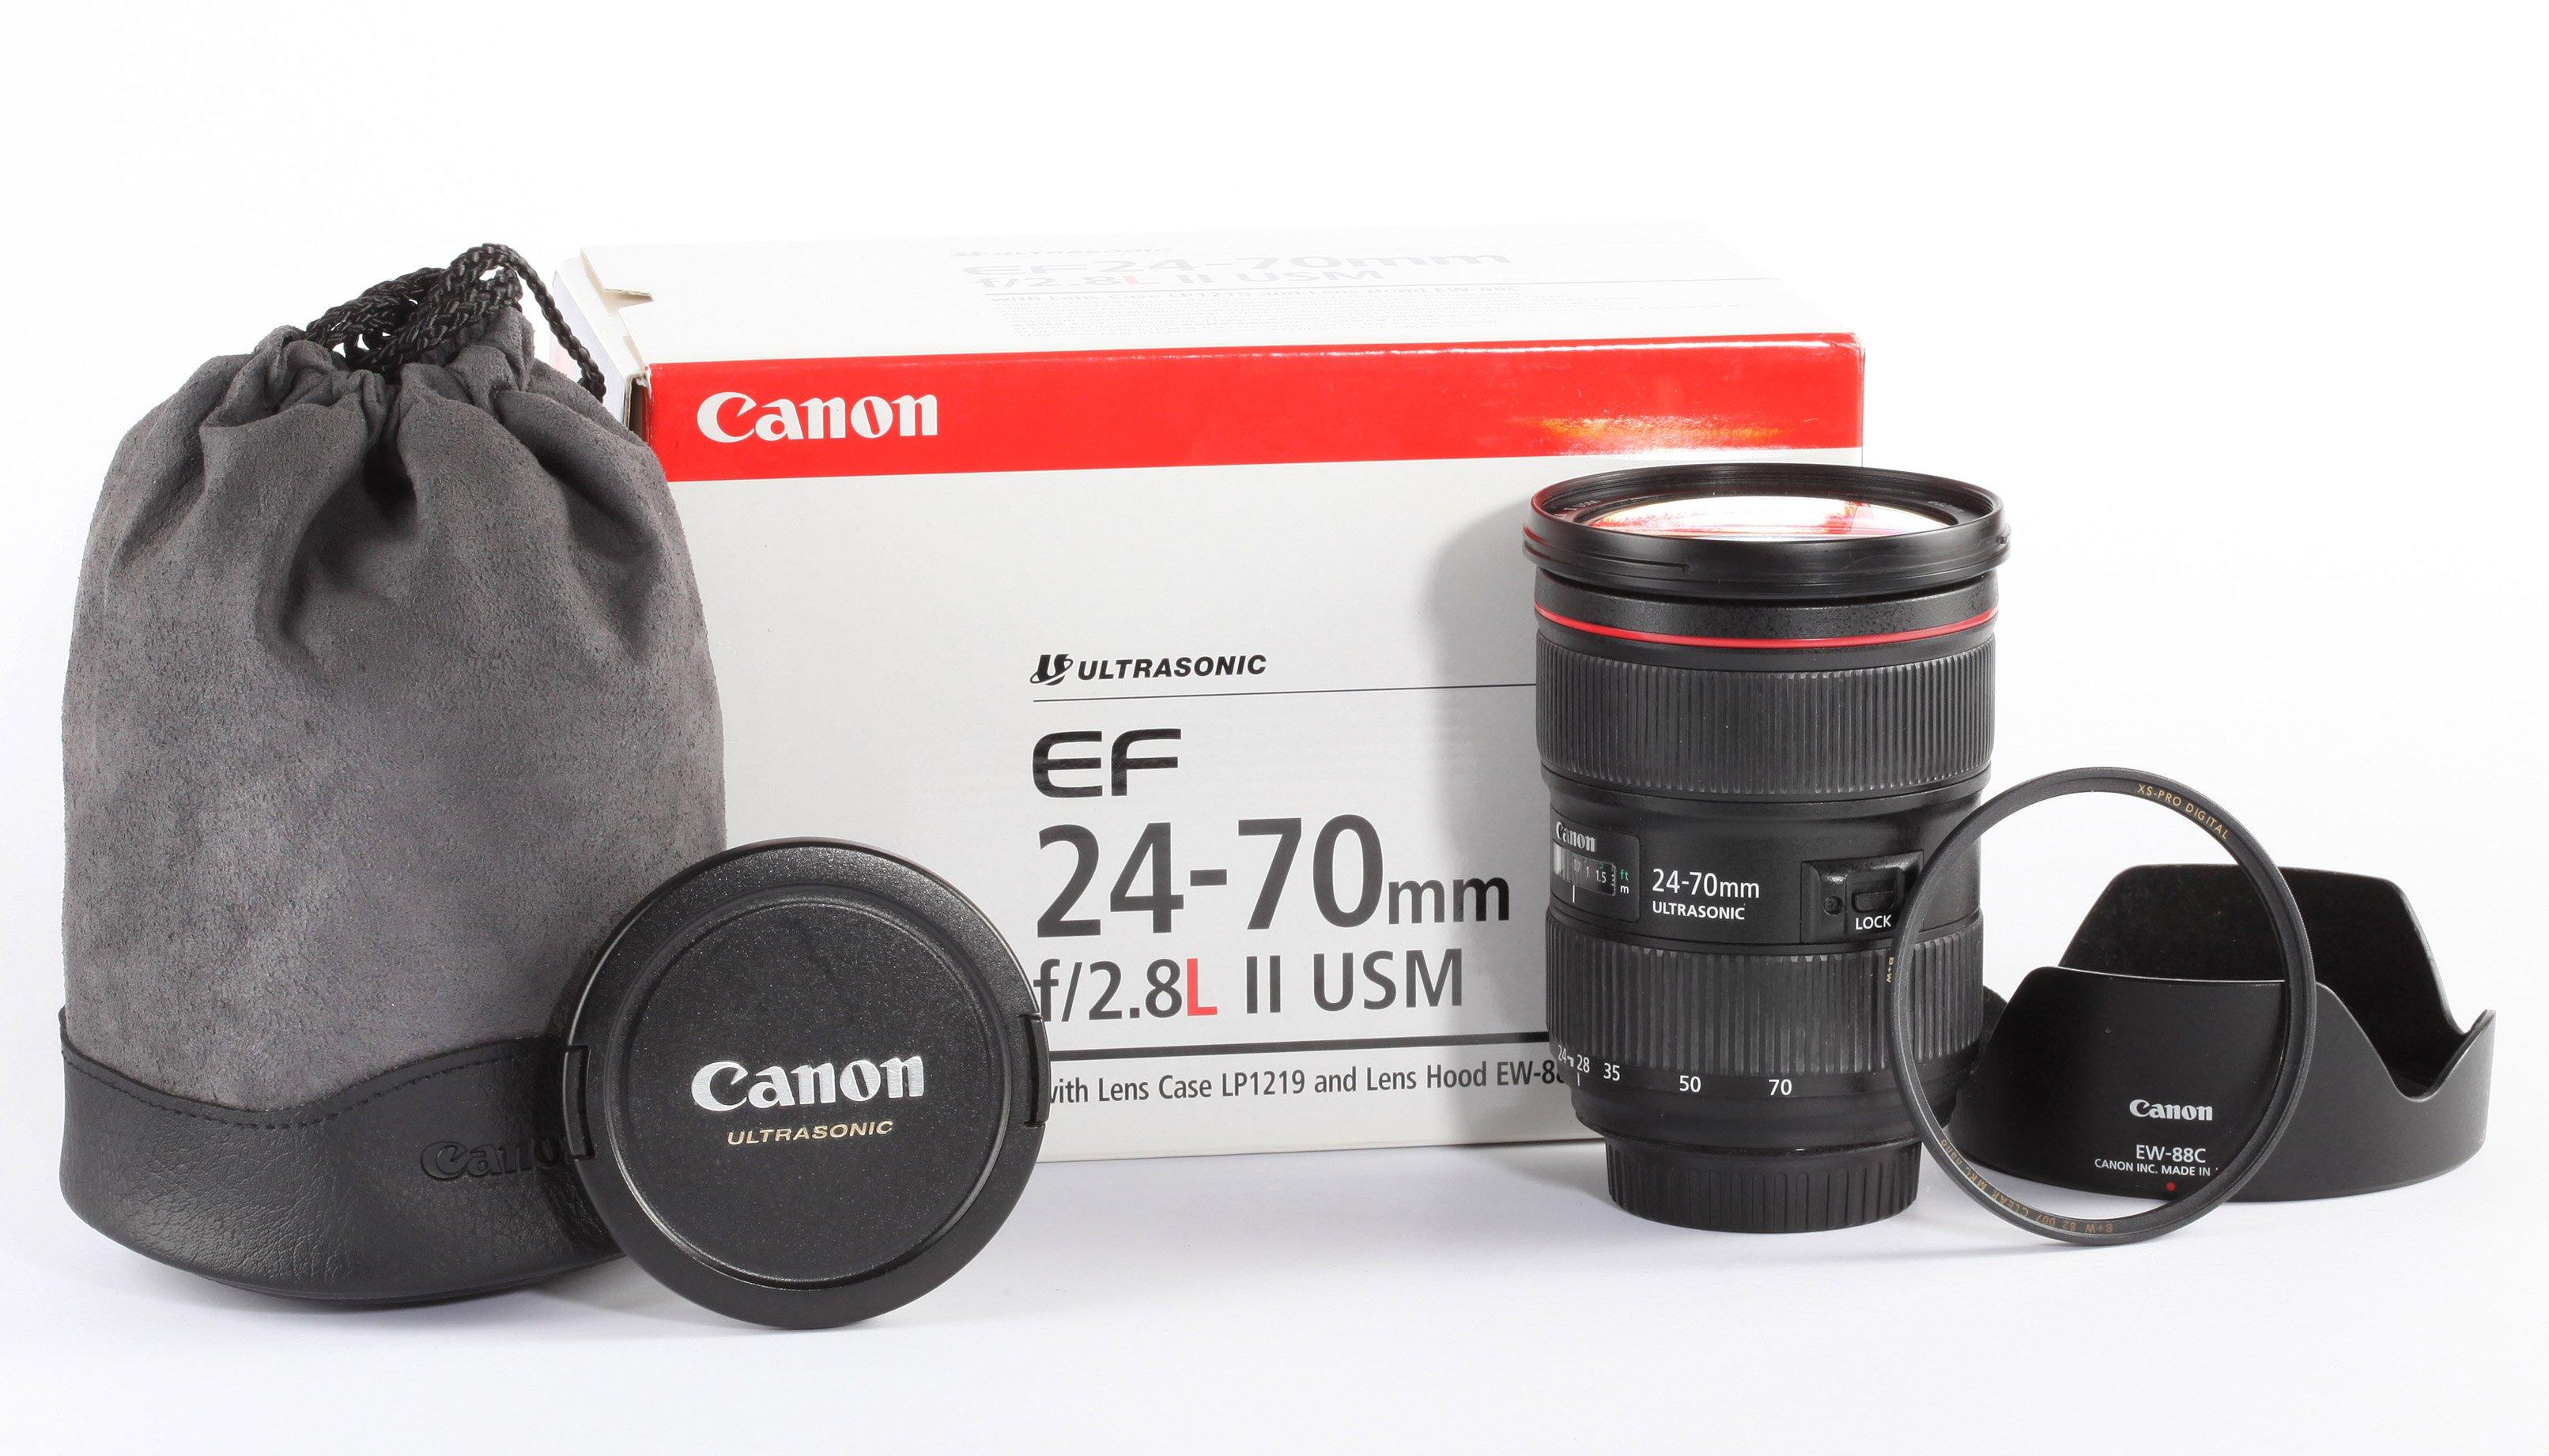 Canon EF 24-70mm 2,8 L II USM